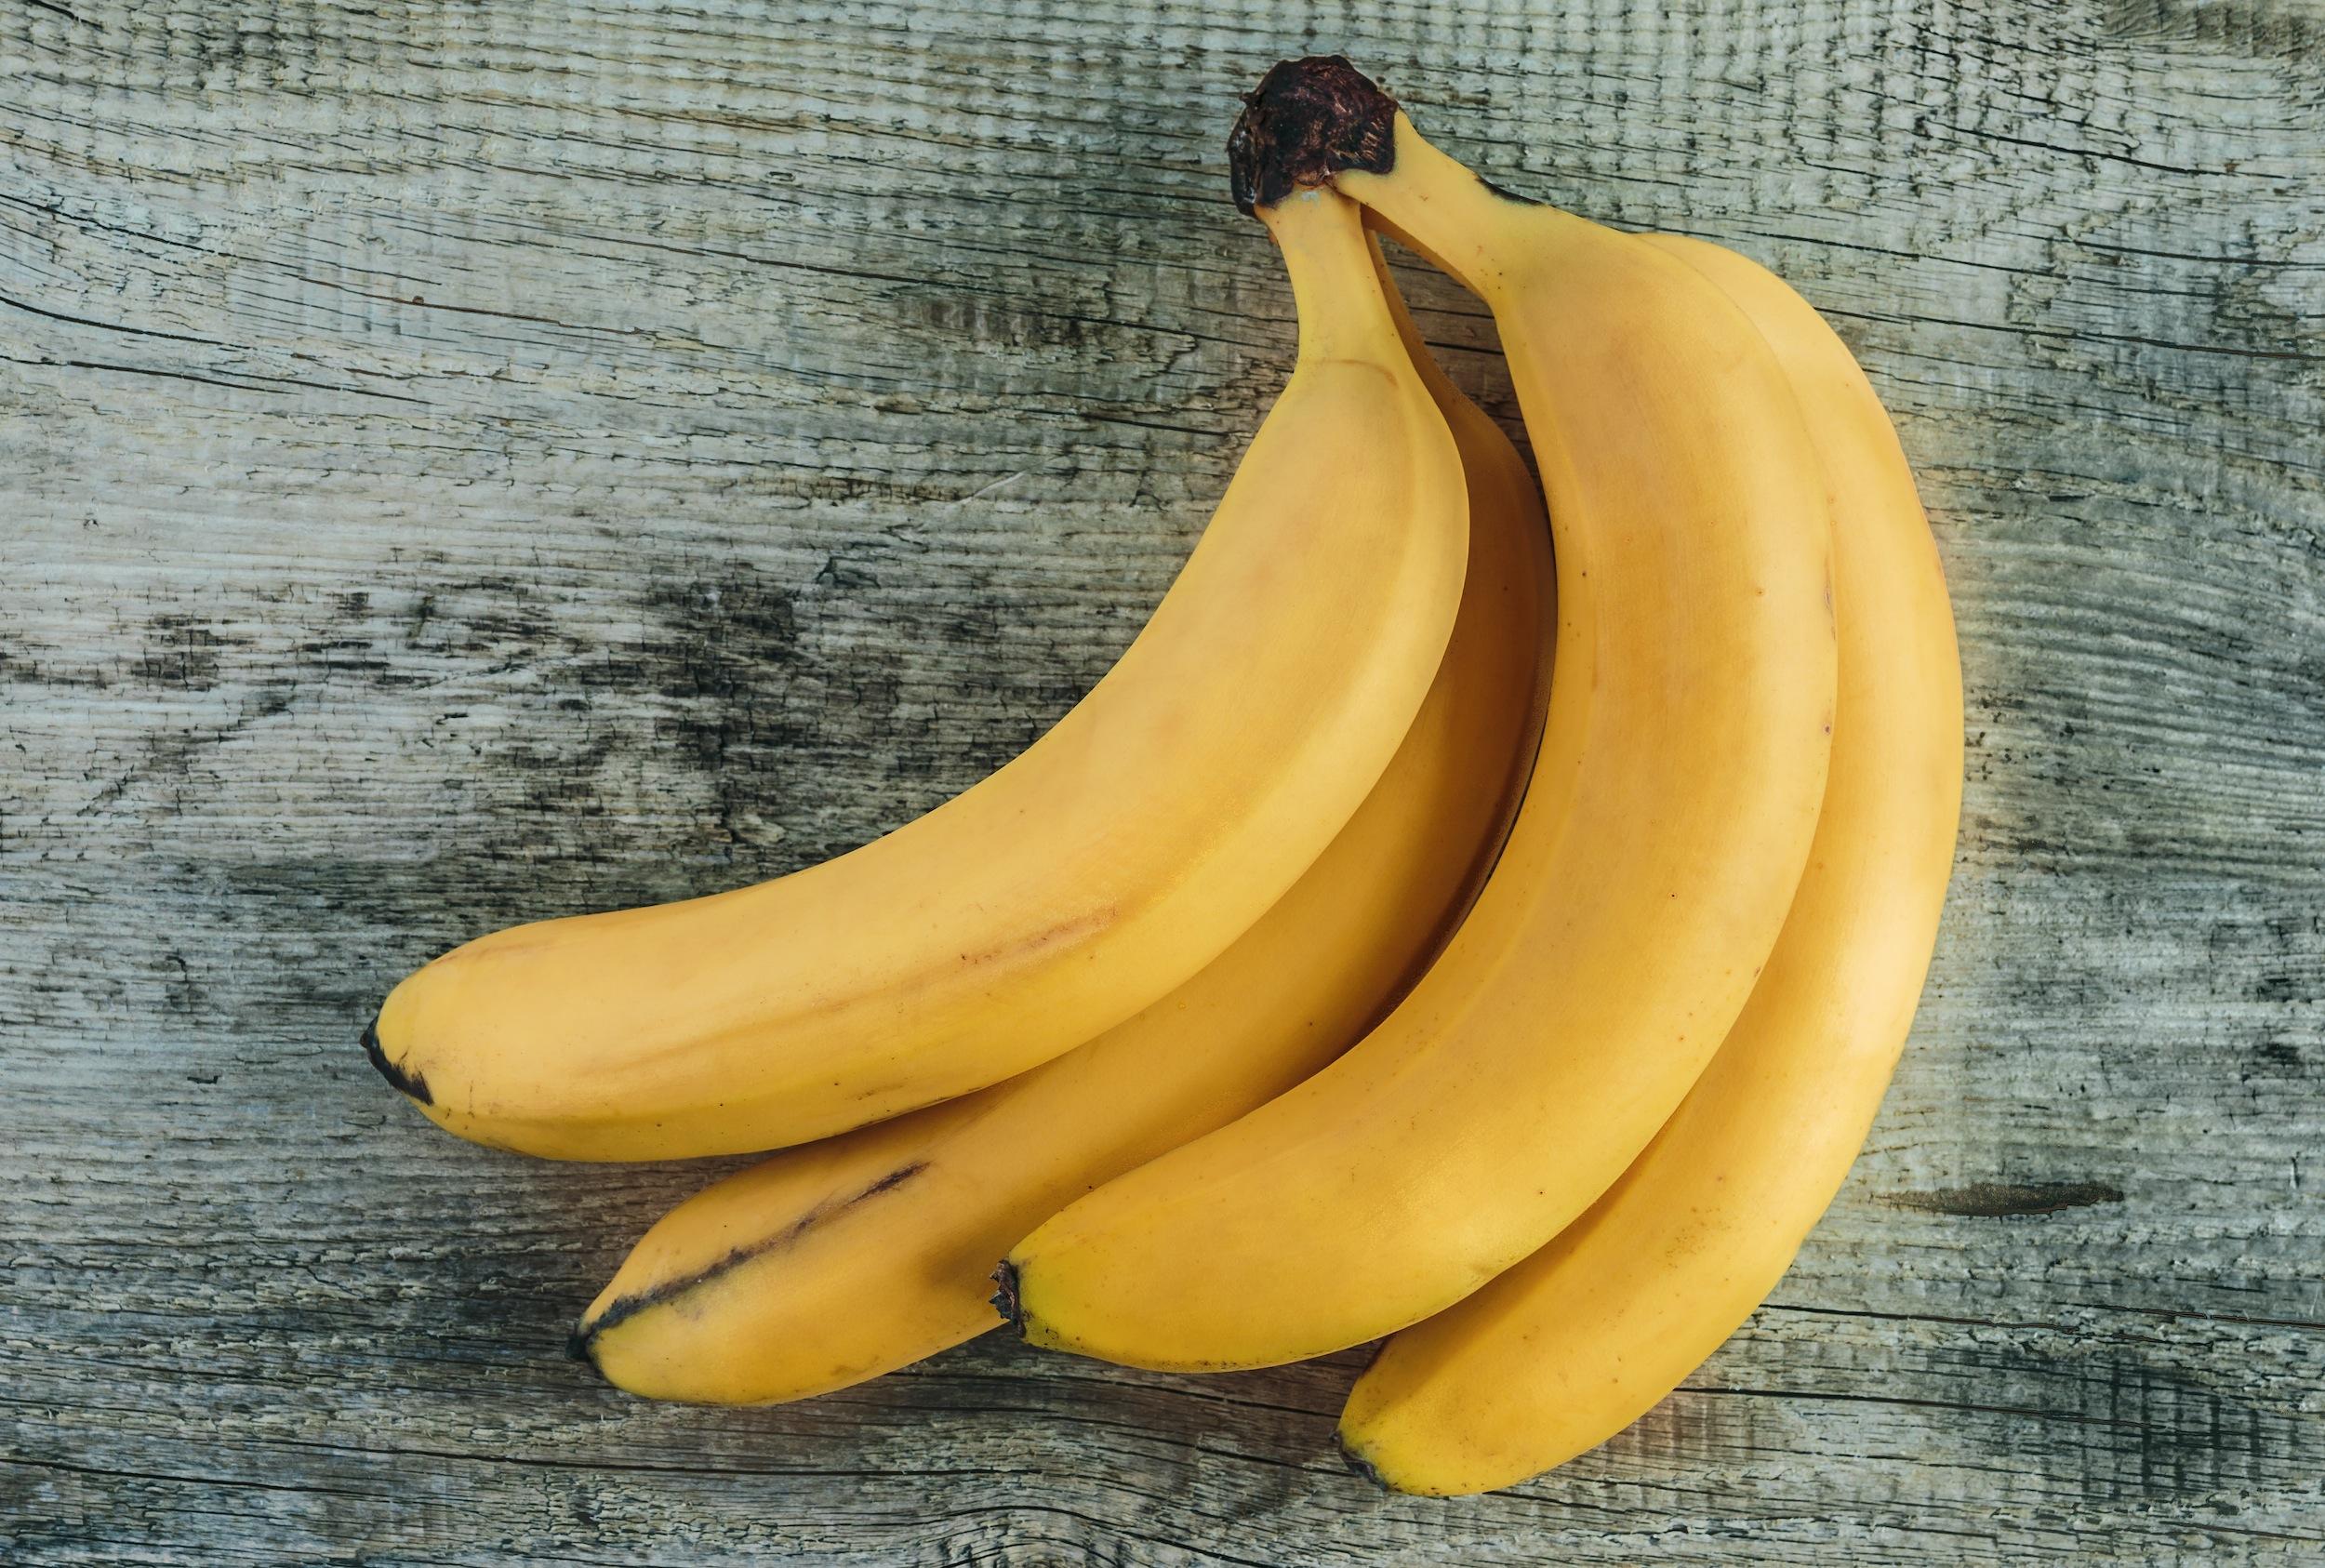 health benefits of bananas - organic media network - organic bananas - banana nutritional info - nutritional benefits of bananas